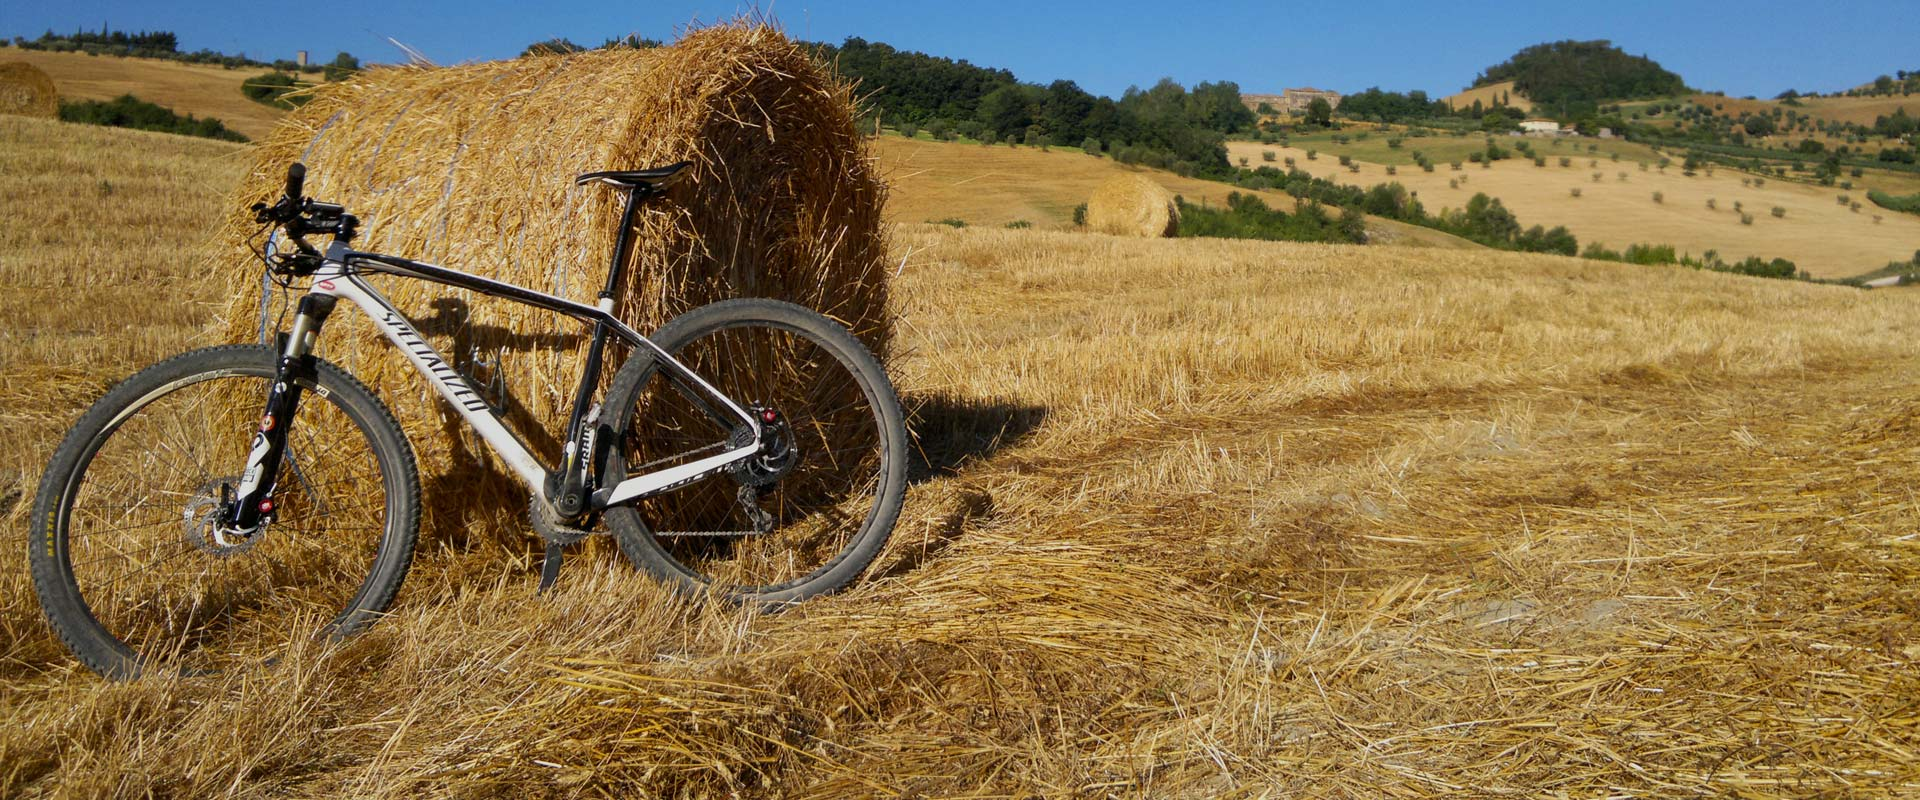 trekking e biking fattoria san donato